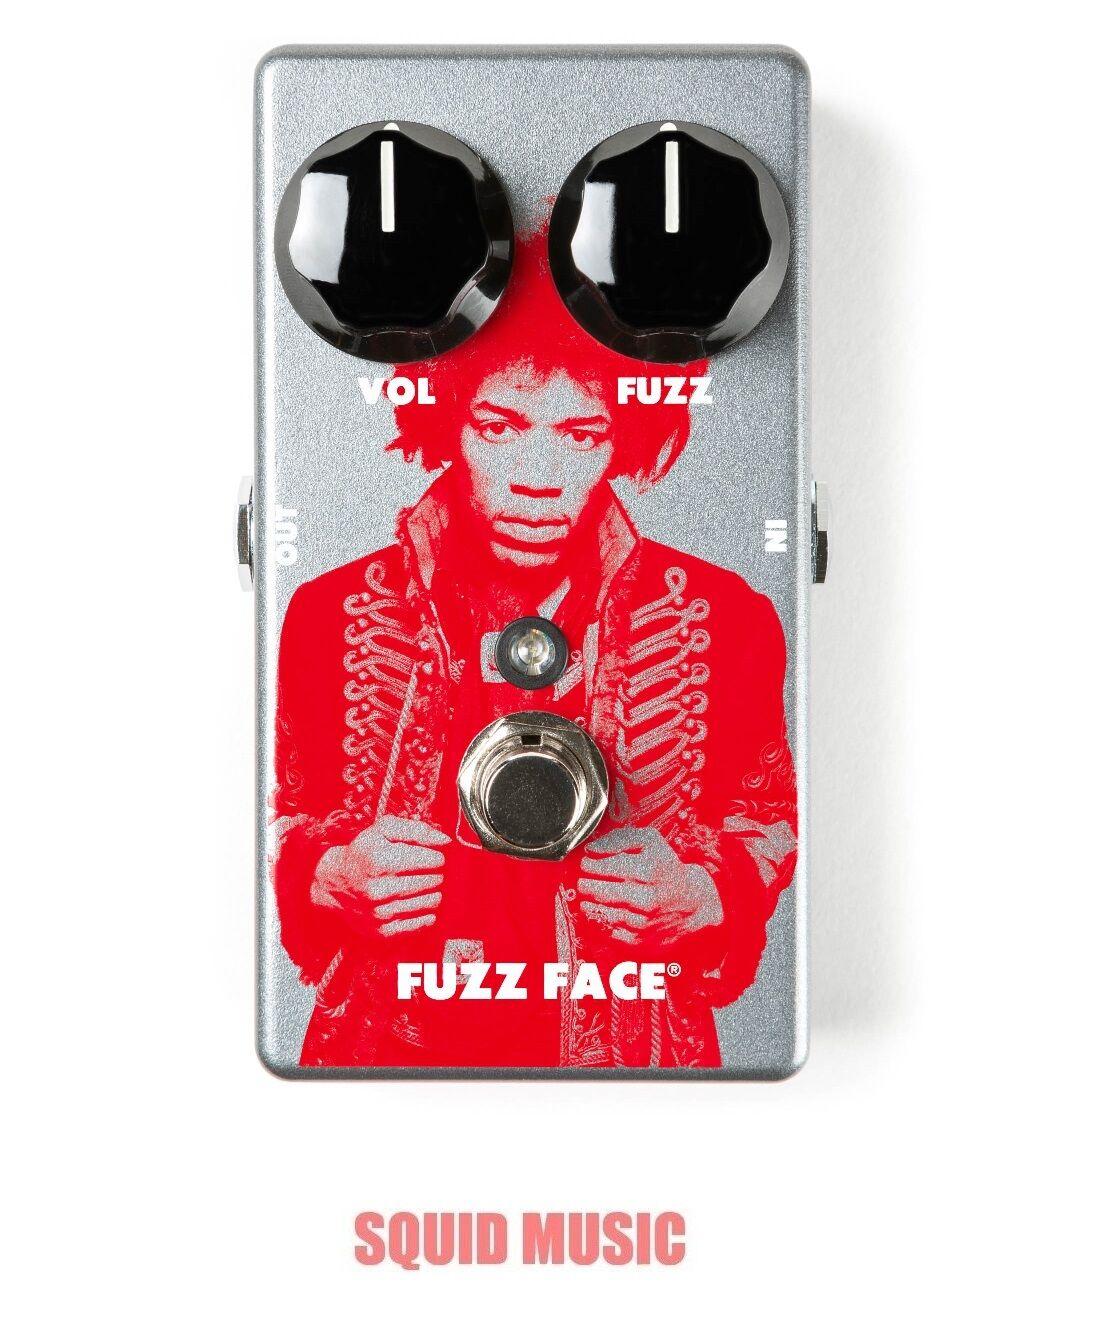 Dunlop JHM5 Jimi Hendrix Fuzz Face Distortion Pedal Rep Dallas Arbiter OPEN BOX